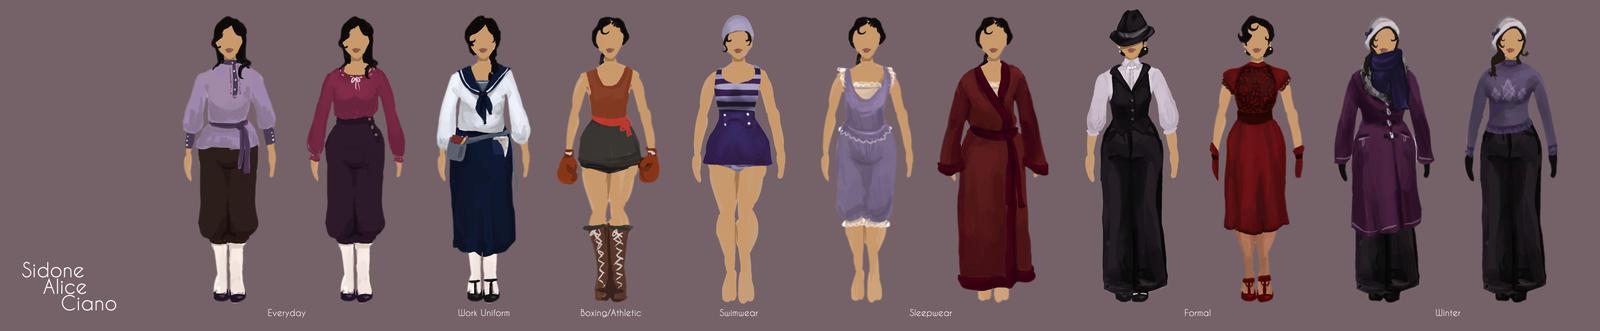 Sidone Ciano Wardrobe by saturnmarieson